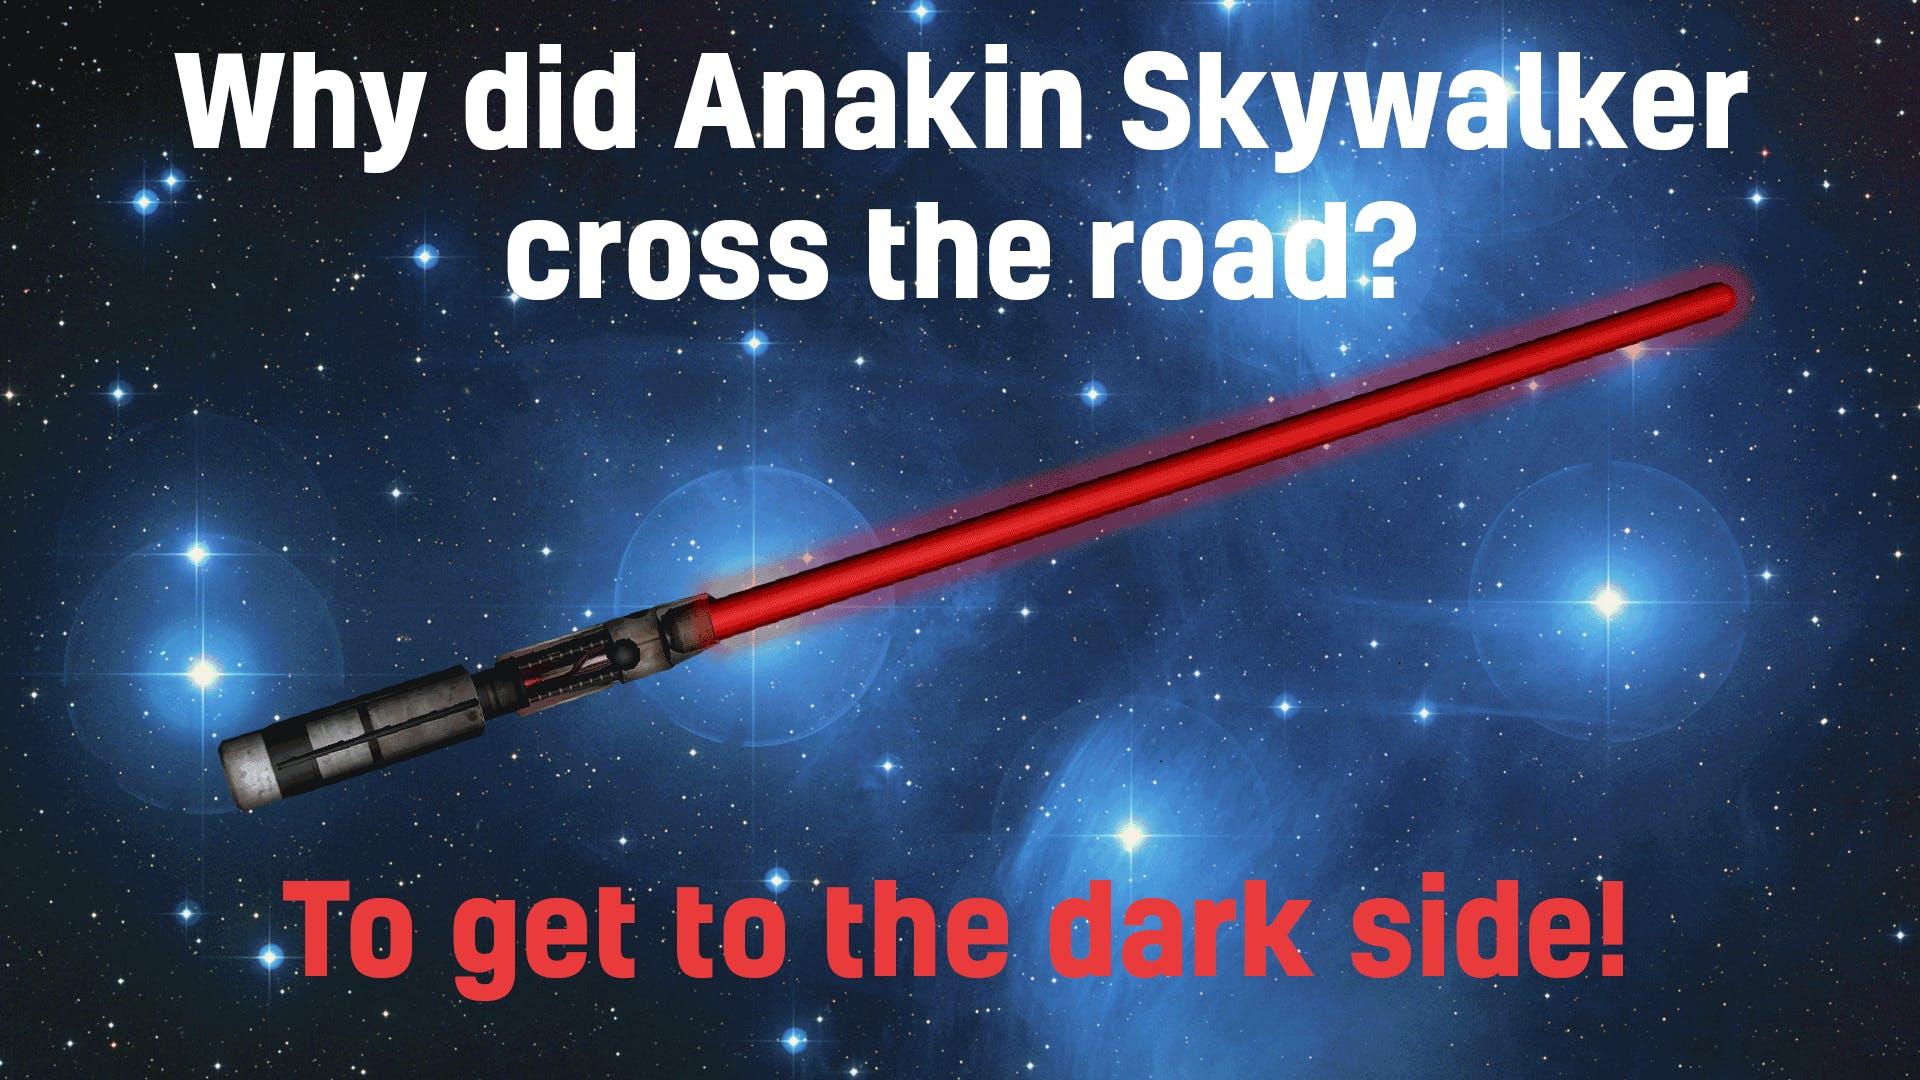 Why did Anakin Skywalker cross the road?